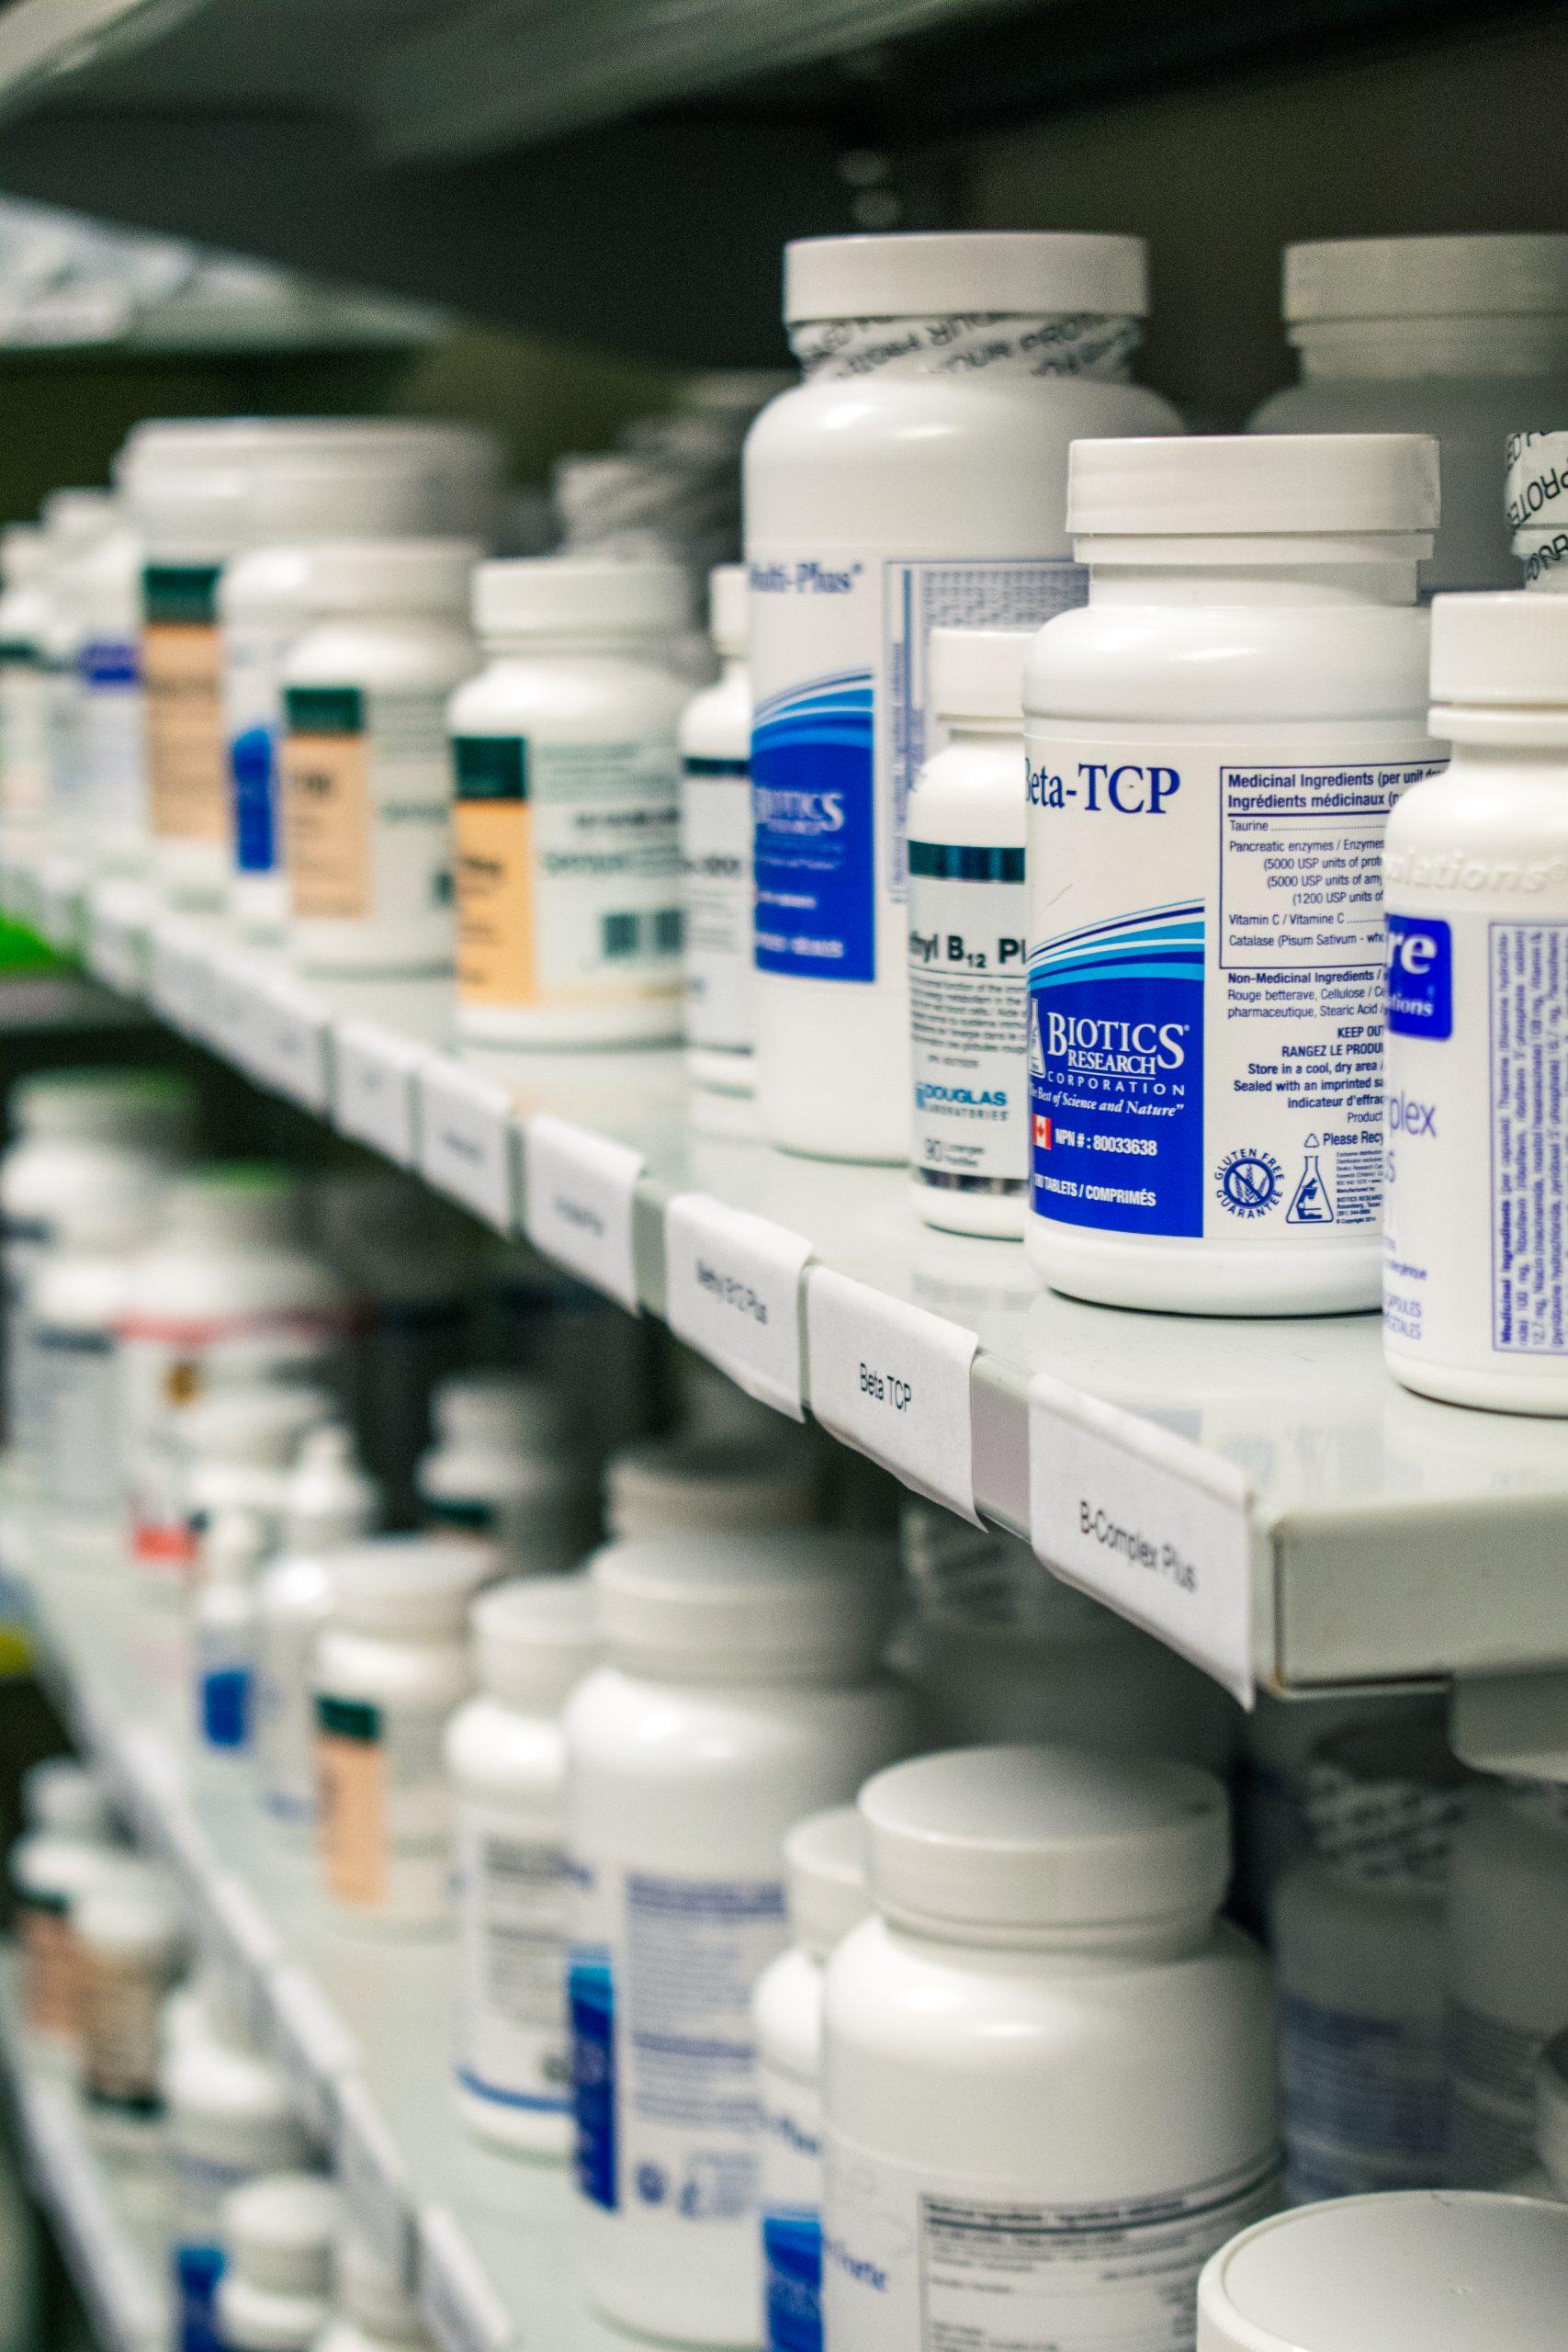 Data to Support Orthomolecular Medicine